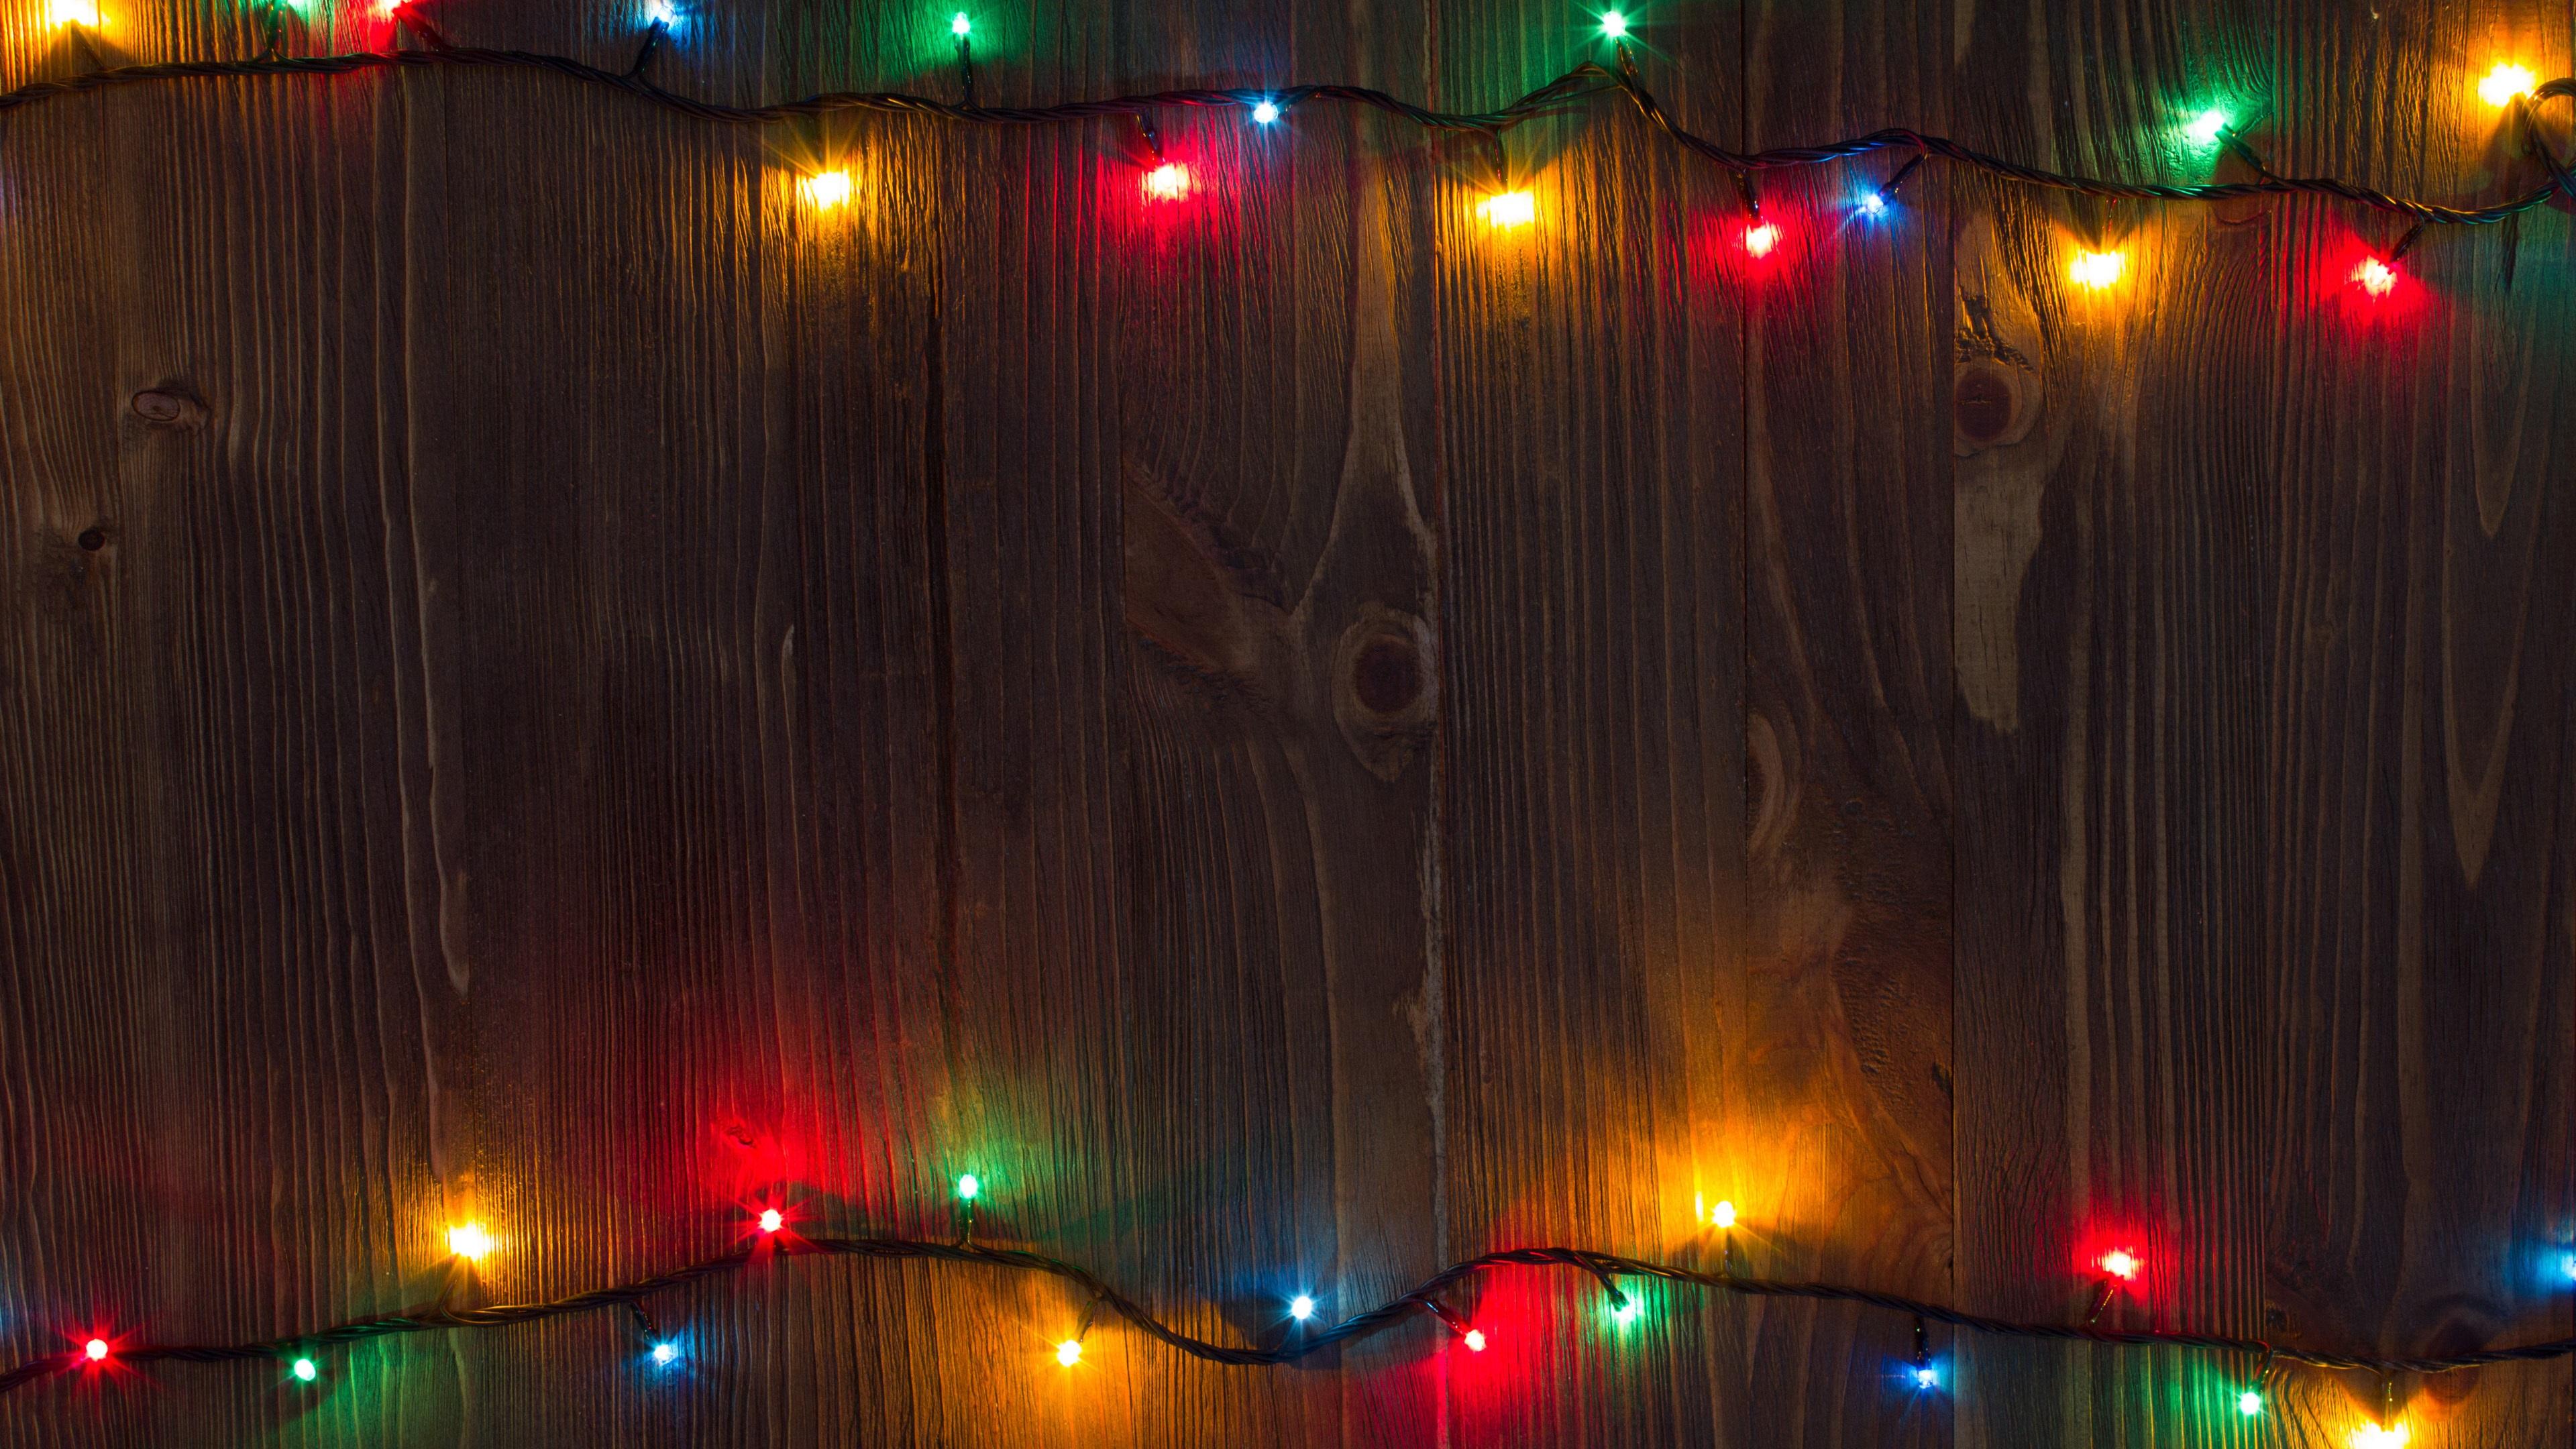 wallpaper colorful holiday lights, wood board 3840x2160 uhd 4k